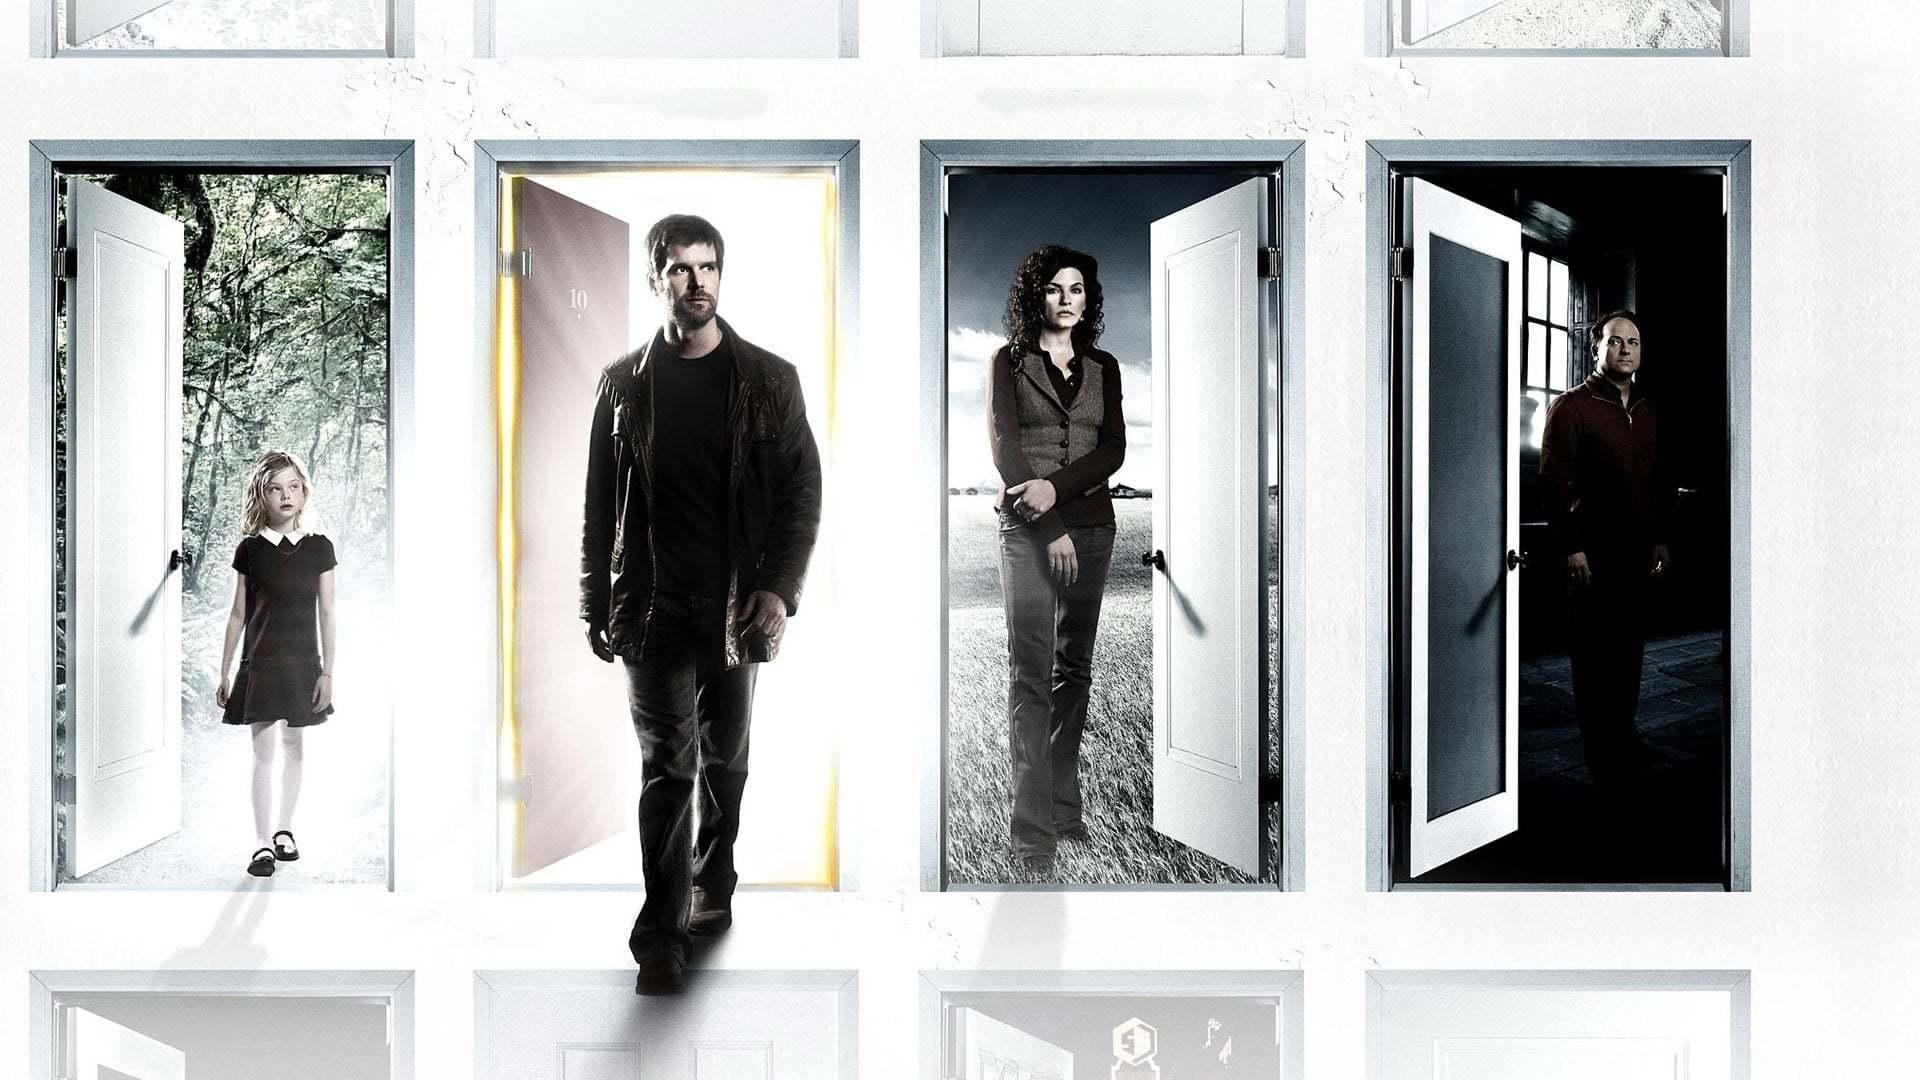 Кадры из фильма Потерянная комната The Lost Room 2006